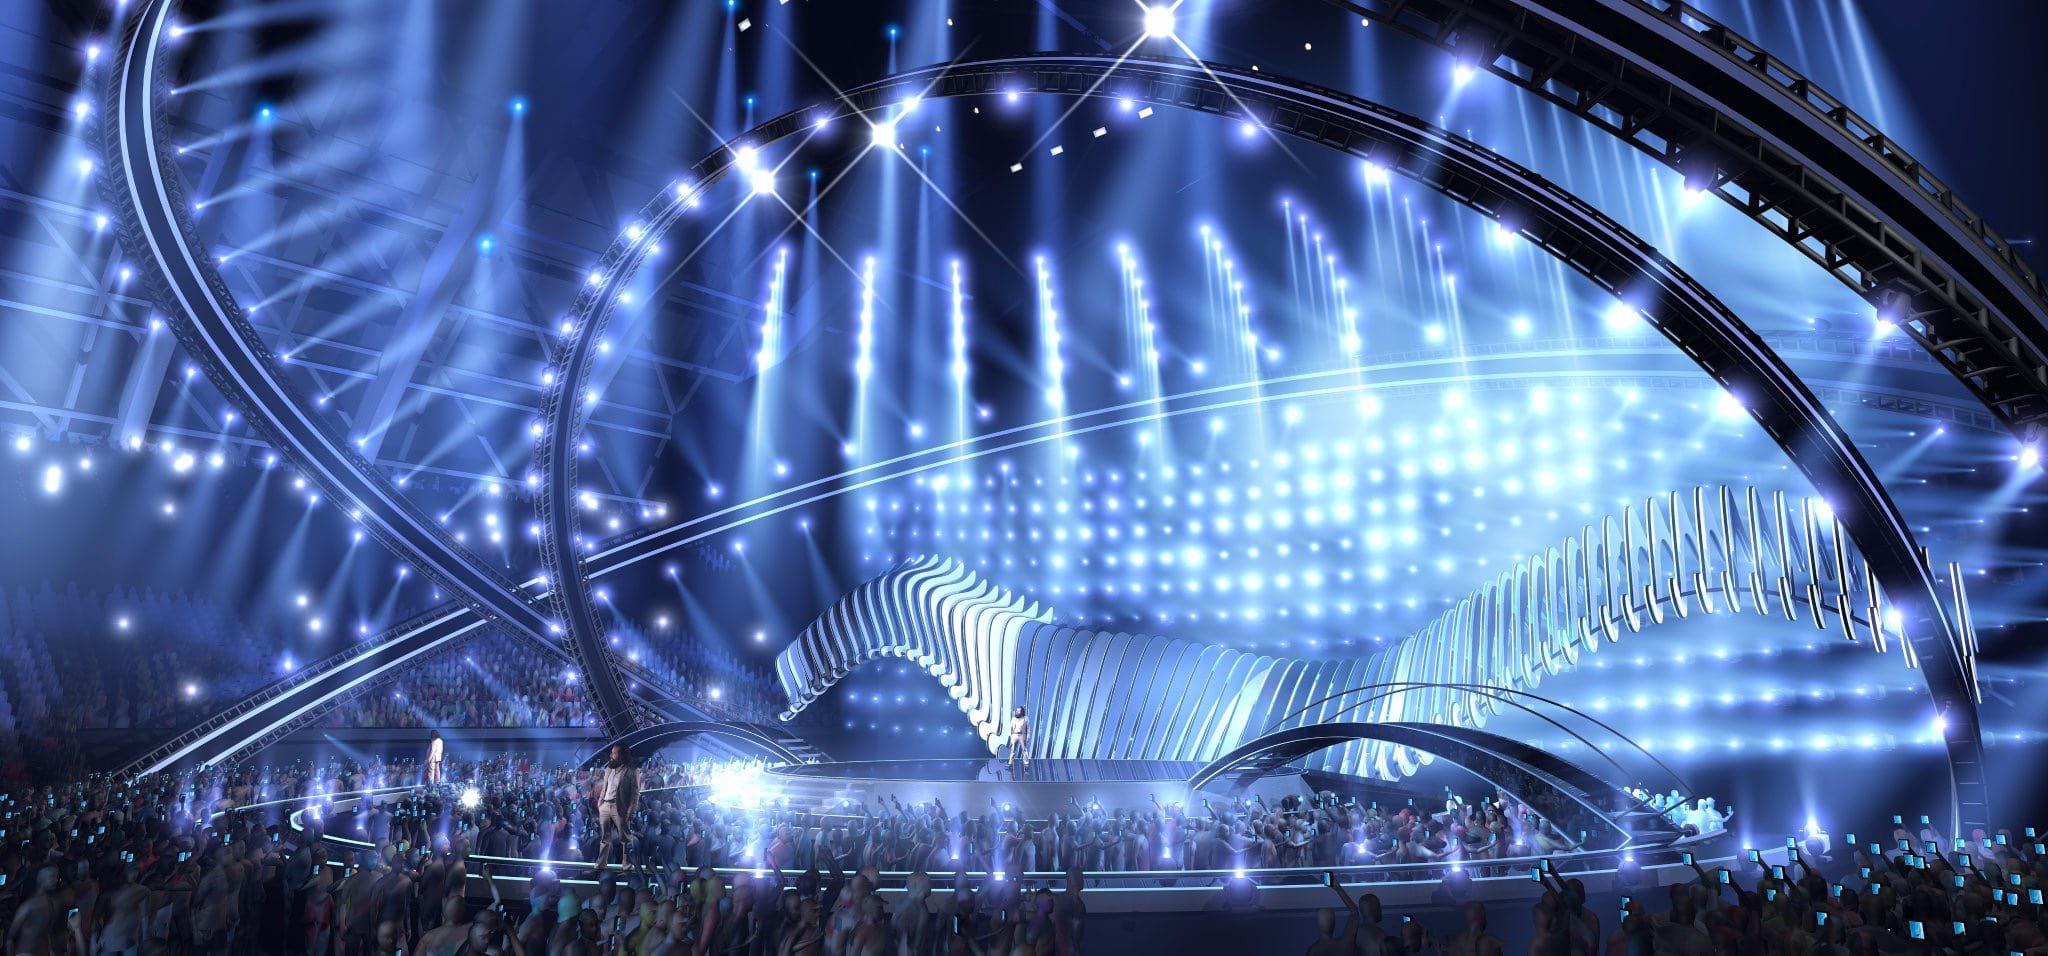 Eurovision 2018 Stage